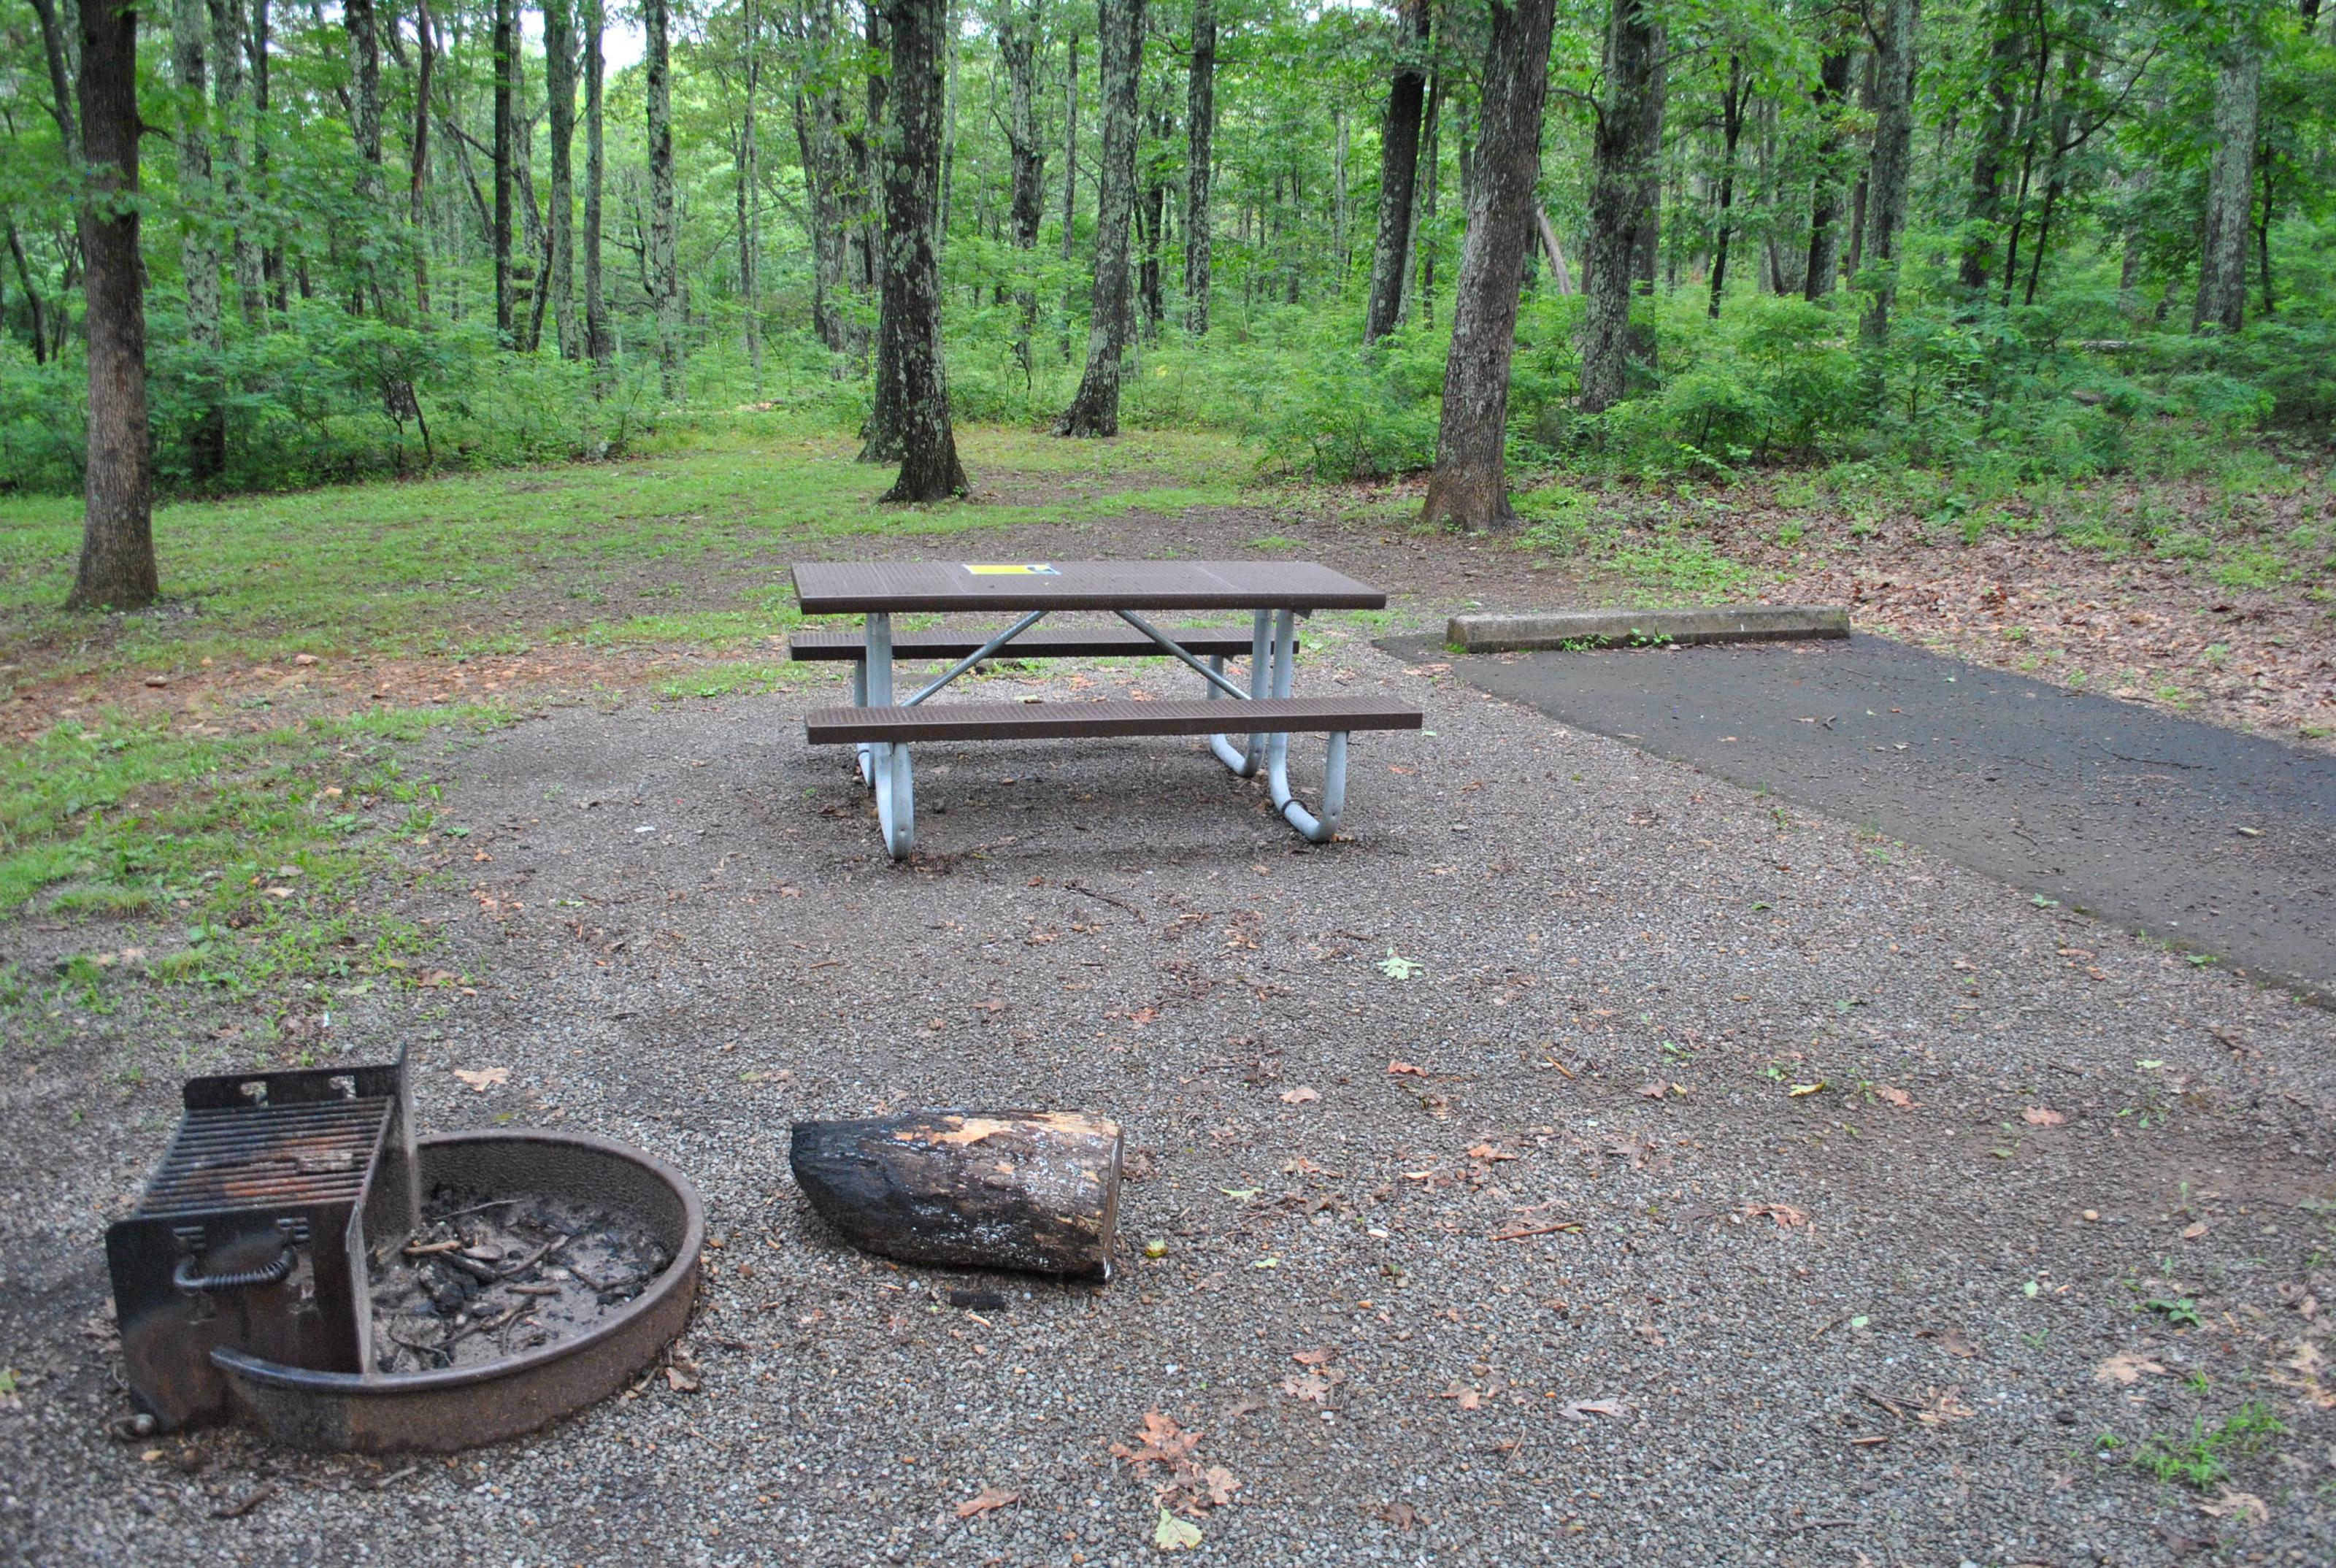 Mathews Arm Campground – Site A028